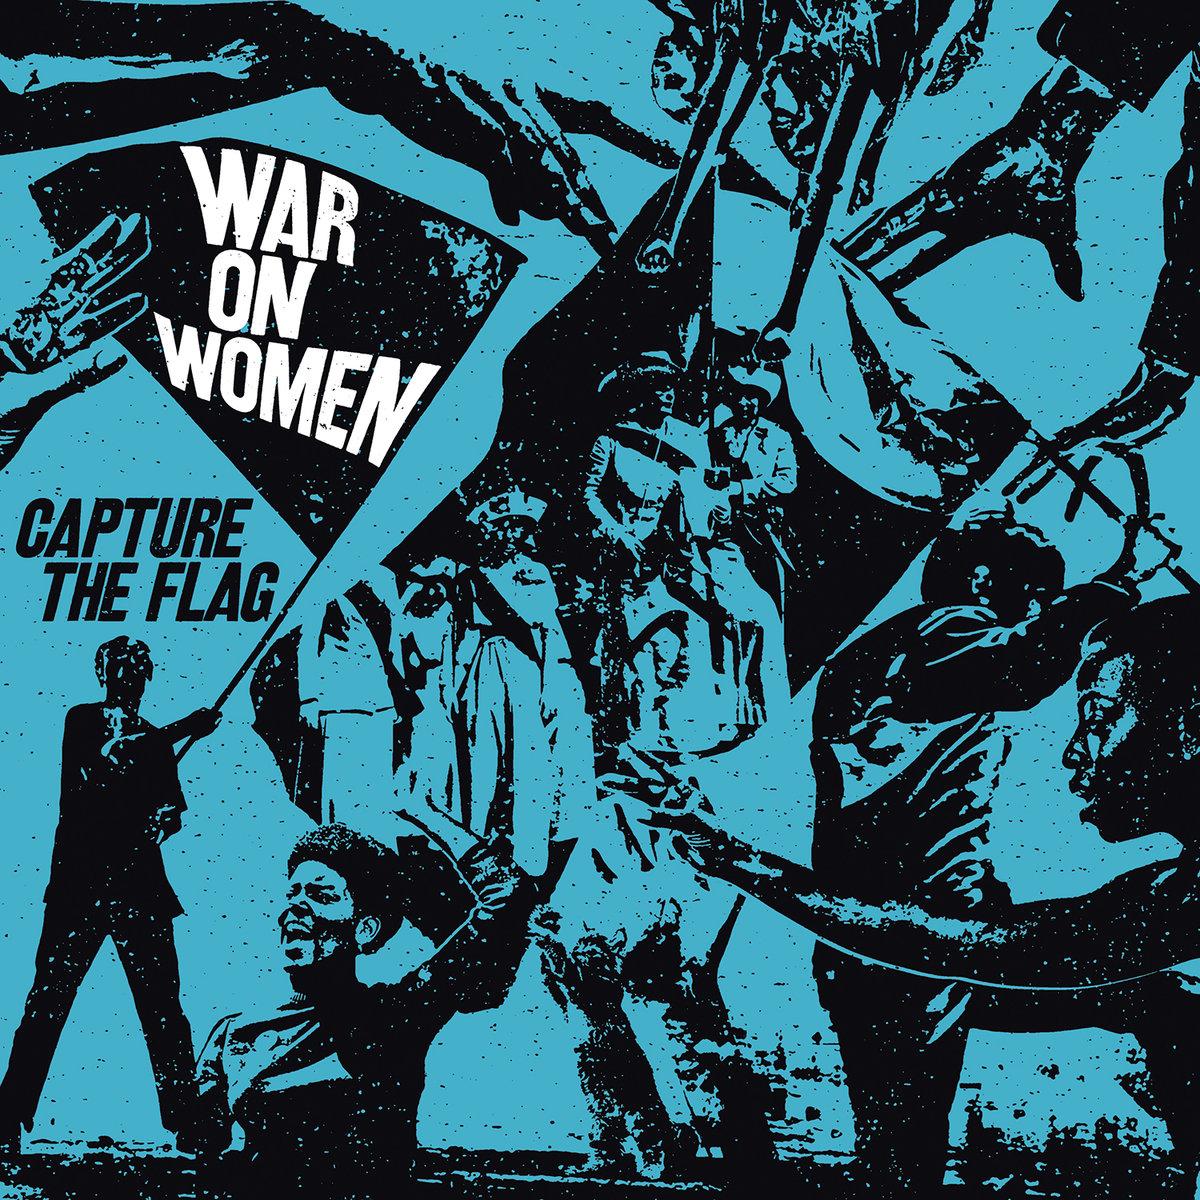 12. War On Women - Capture The Flag